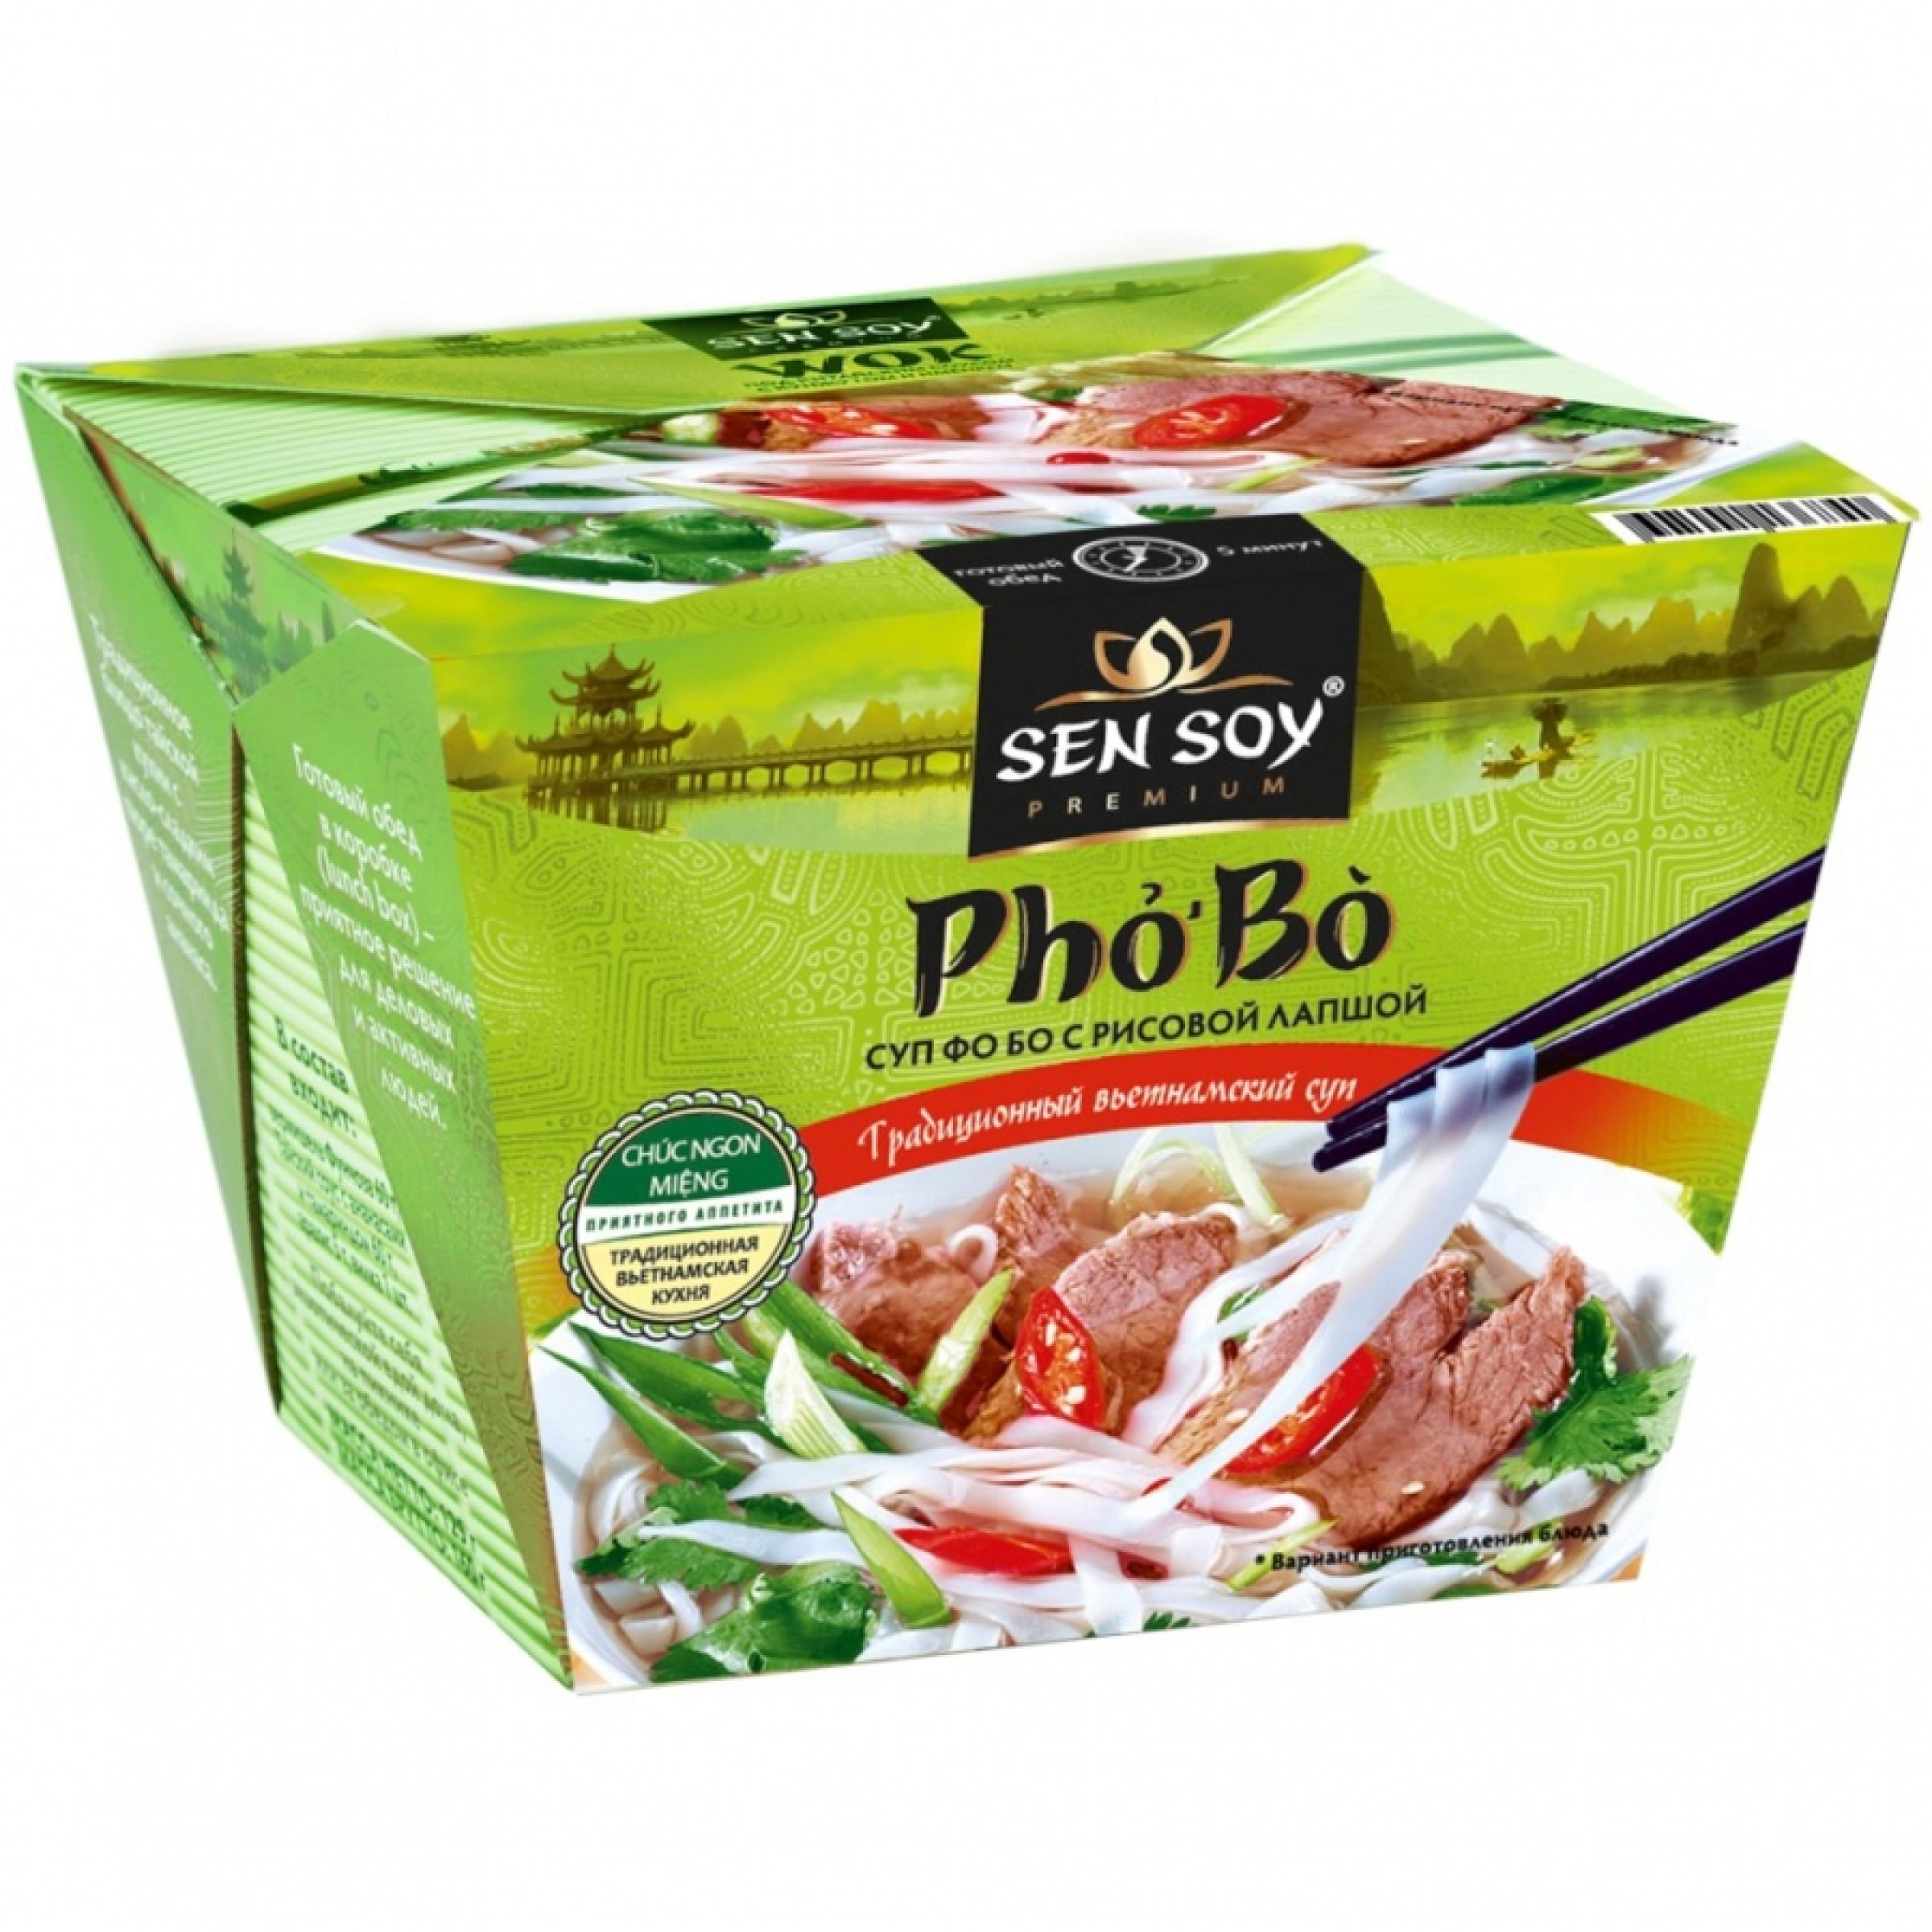 Суп PHO BO с рисовой лапшой Сэн Сой Премиум, 125 гр